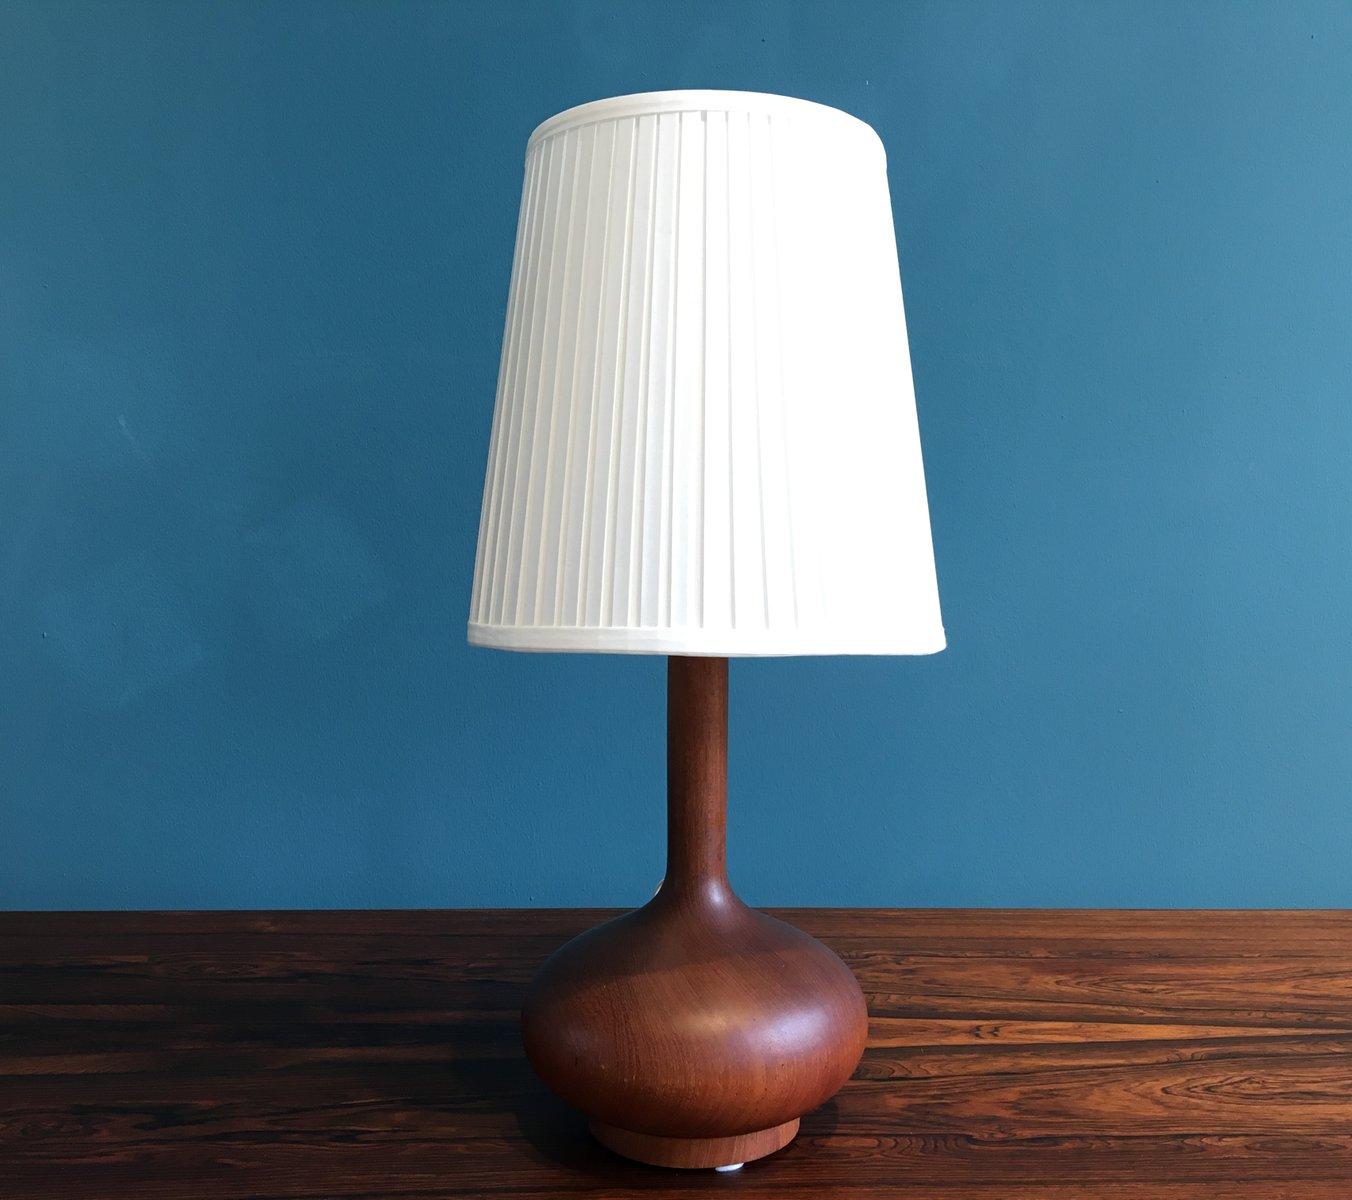 Vintage scandinavian wooden table lamp 1960s for sale at for Vintage wooden table lamps